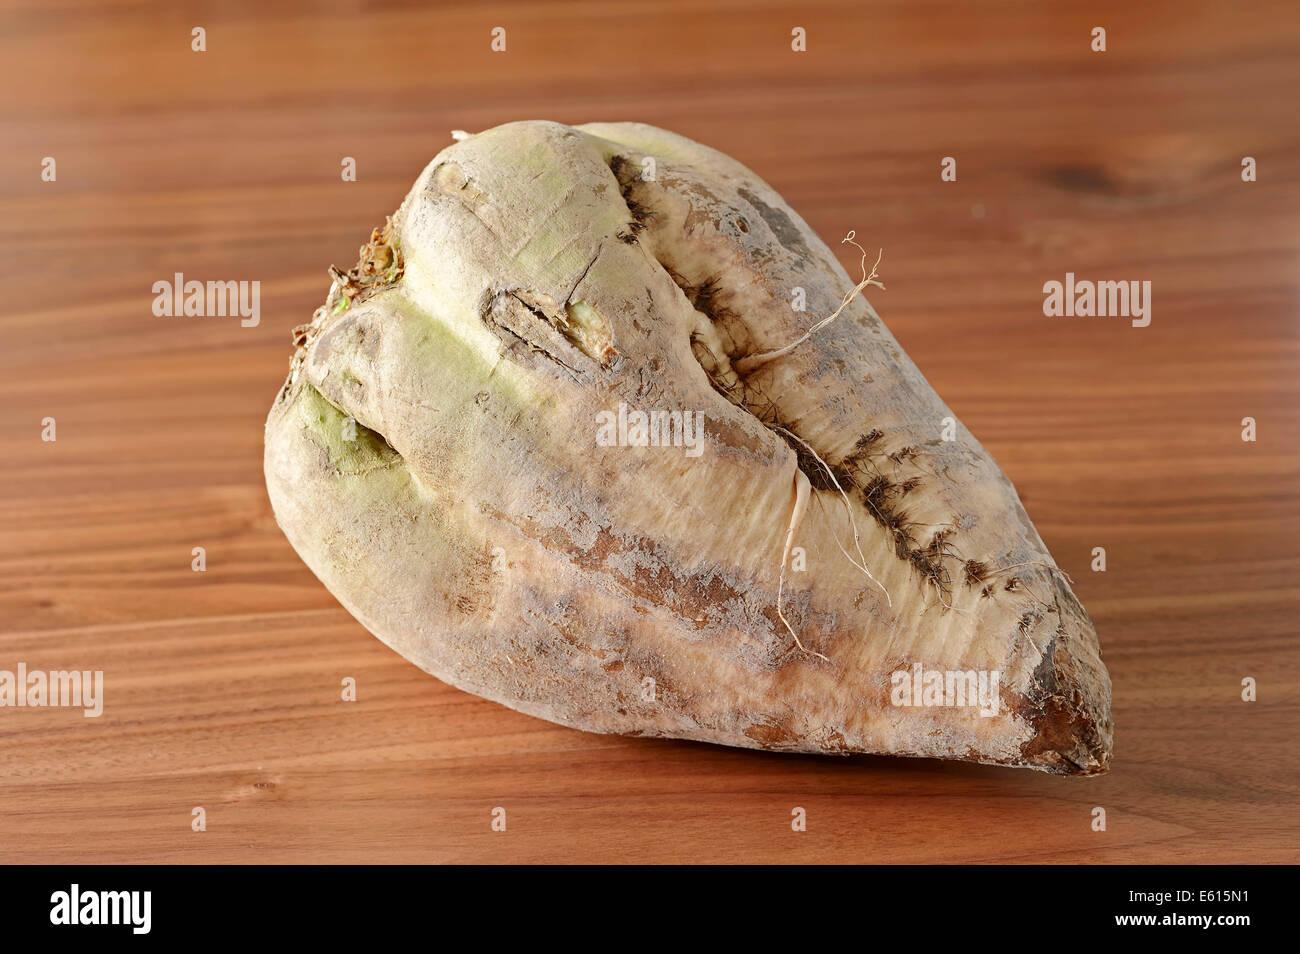 Sugar Beet (Beta vulgaris ssp. vulgaris var. altissima) - Stock Image